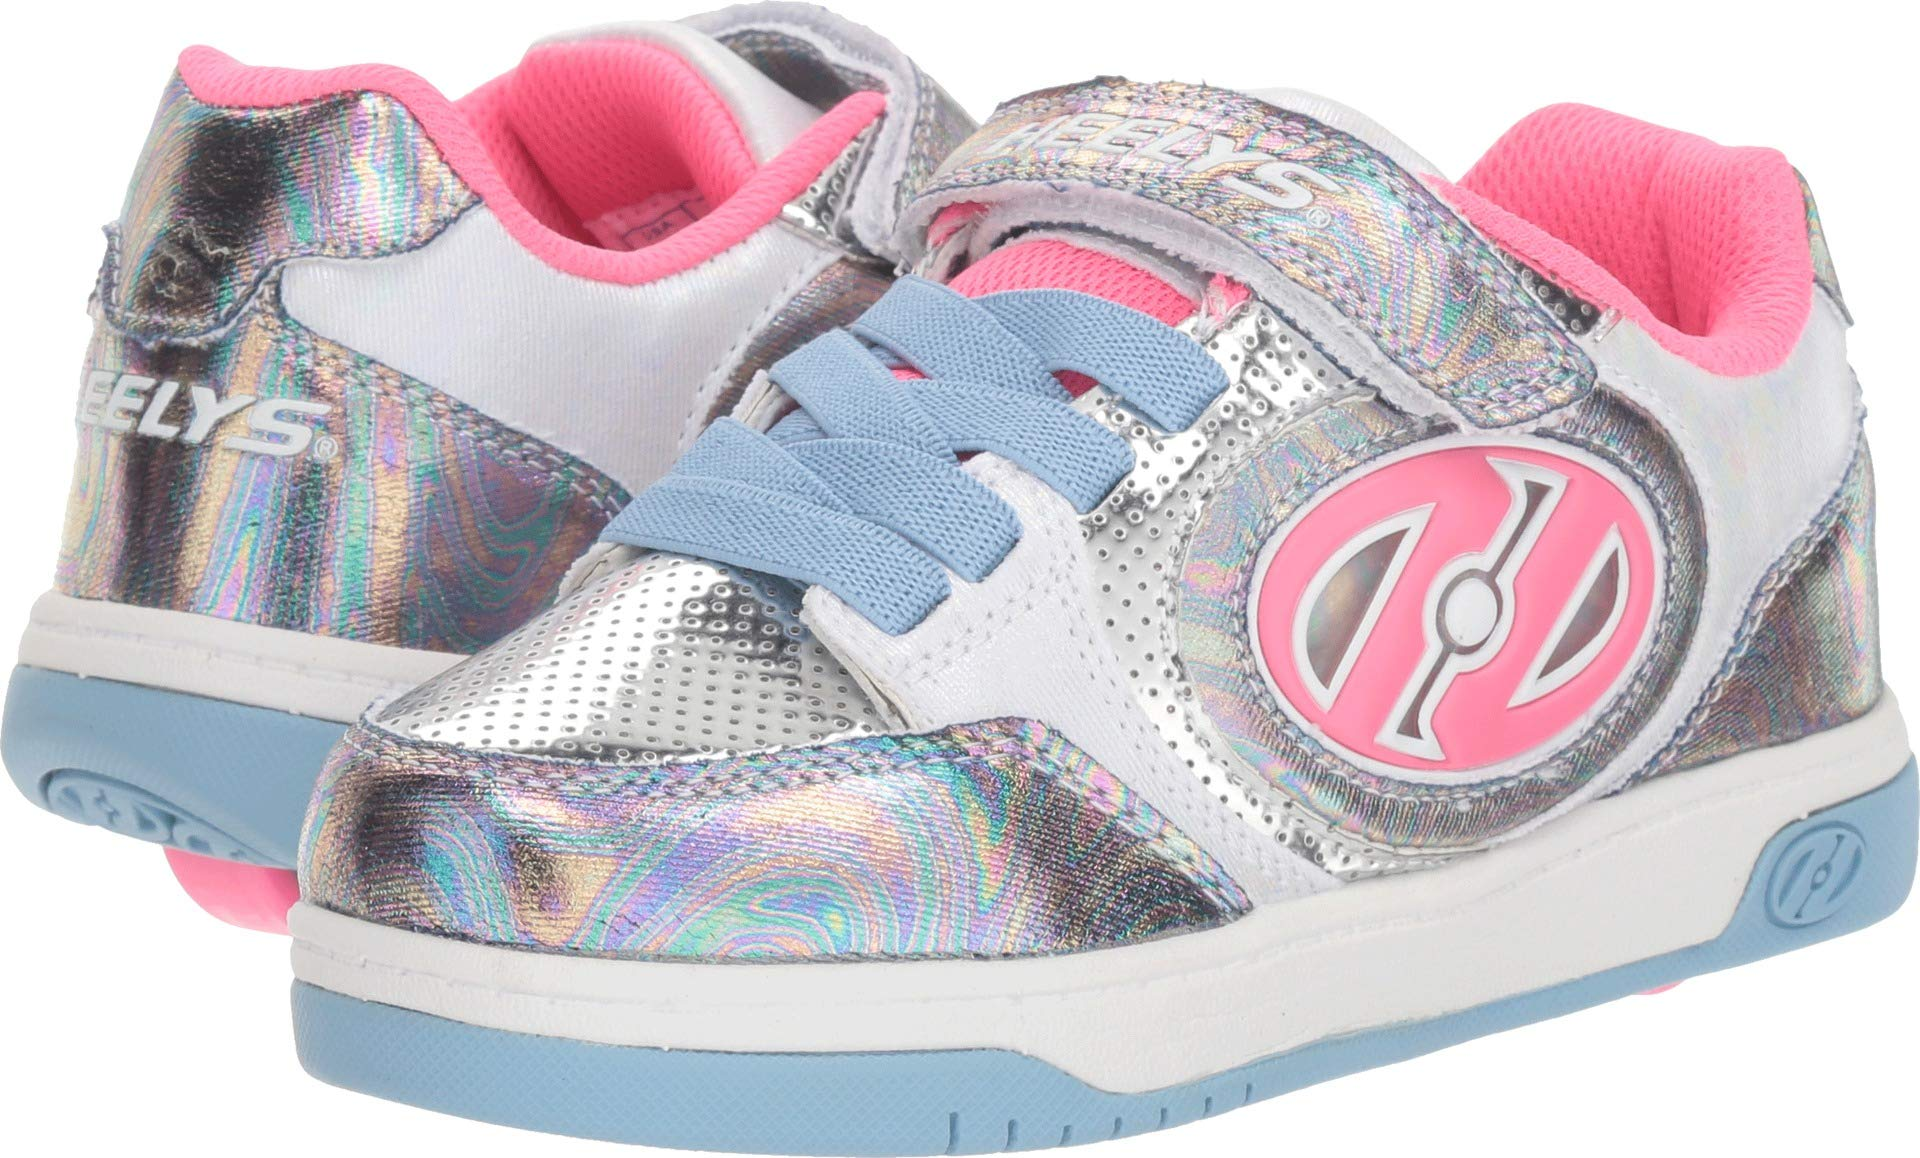 Heelys Girls Plus X2 Lighted Tennis Shoe, Blue/Hologram/Fuchsia, 3 M US Little Kid